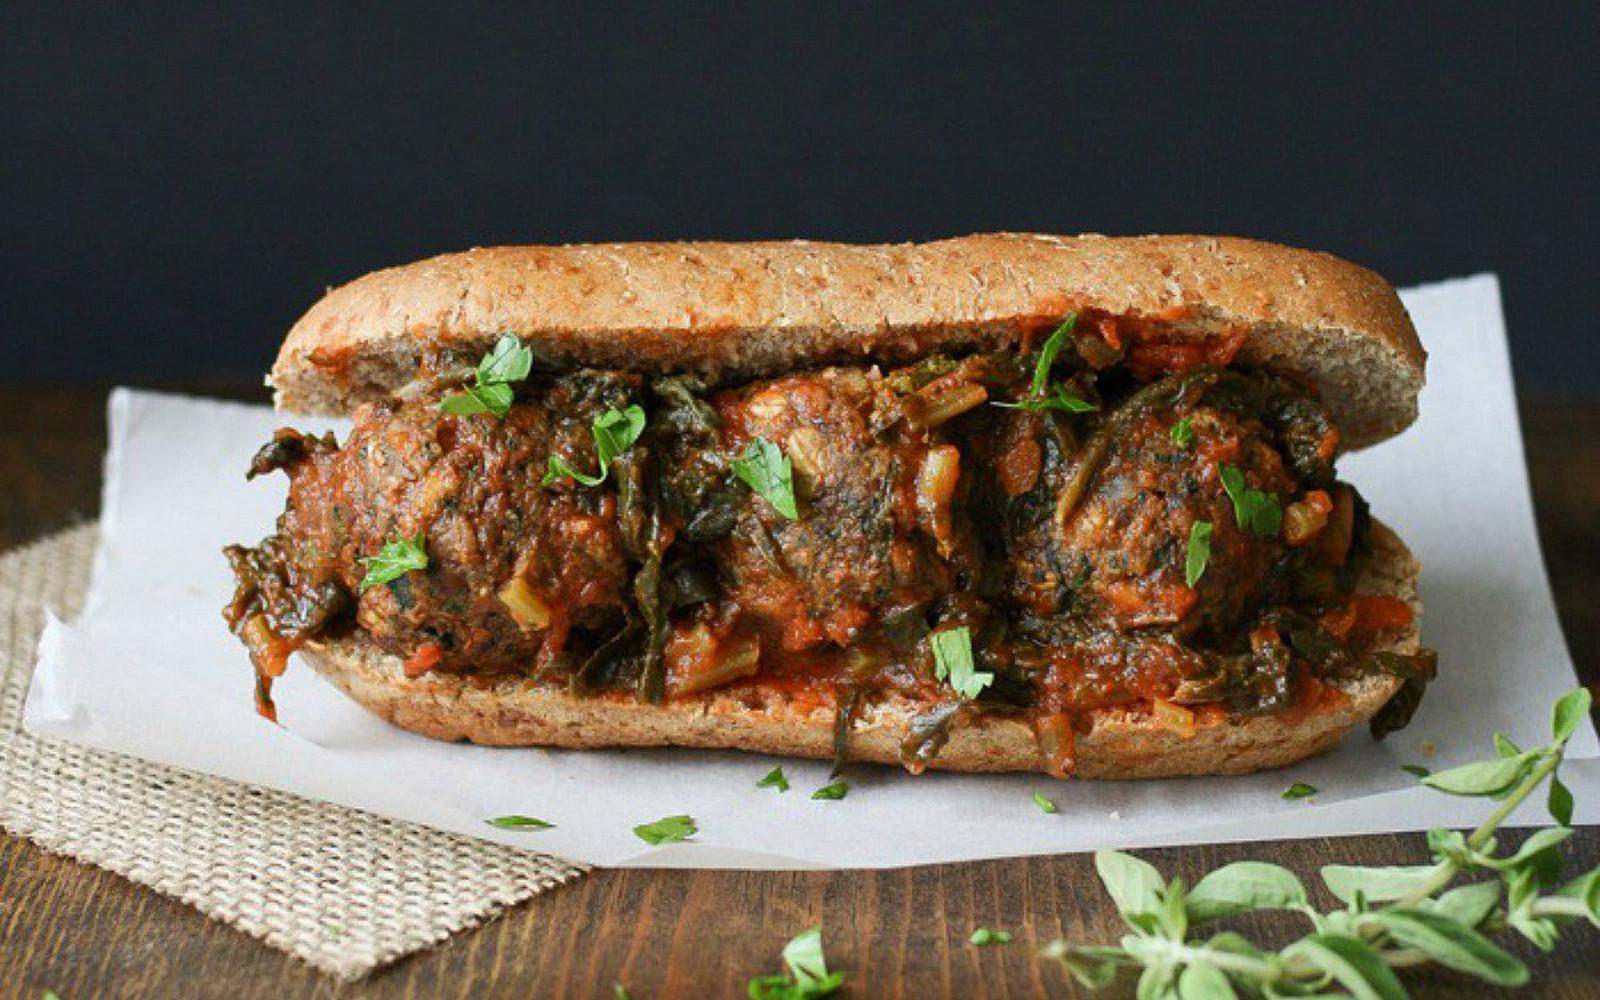 Beanball Sub Sandwich With Marinara and Greens